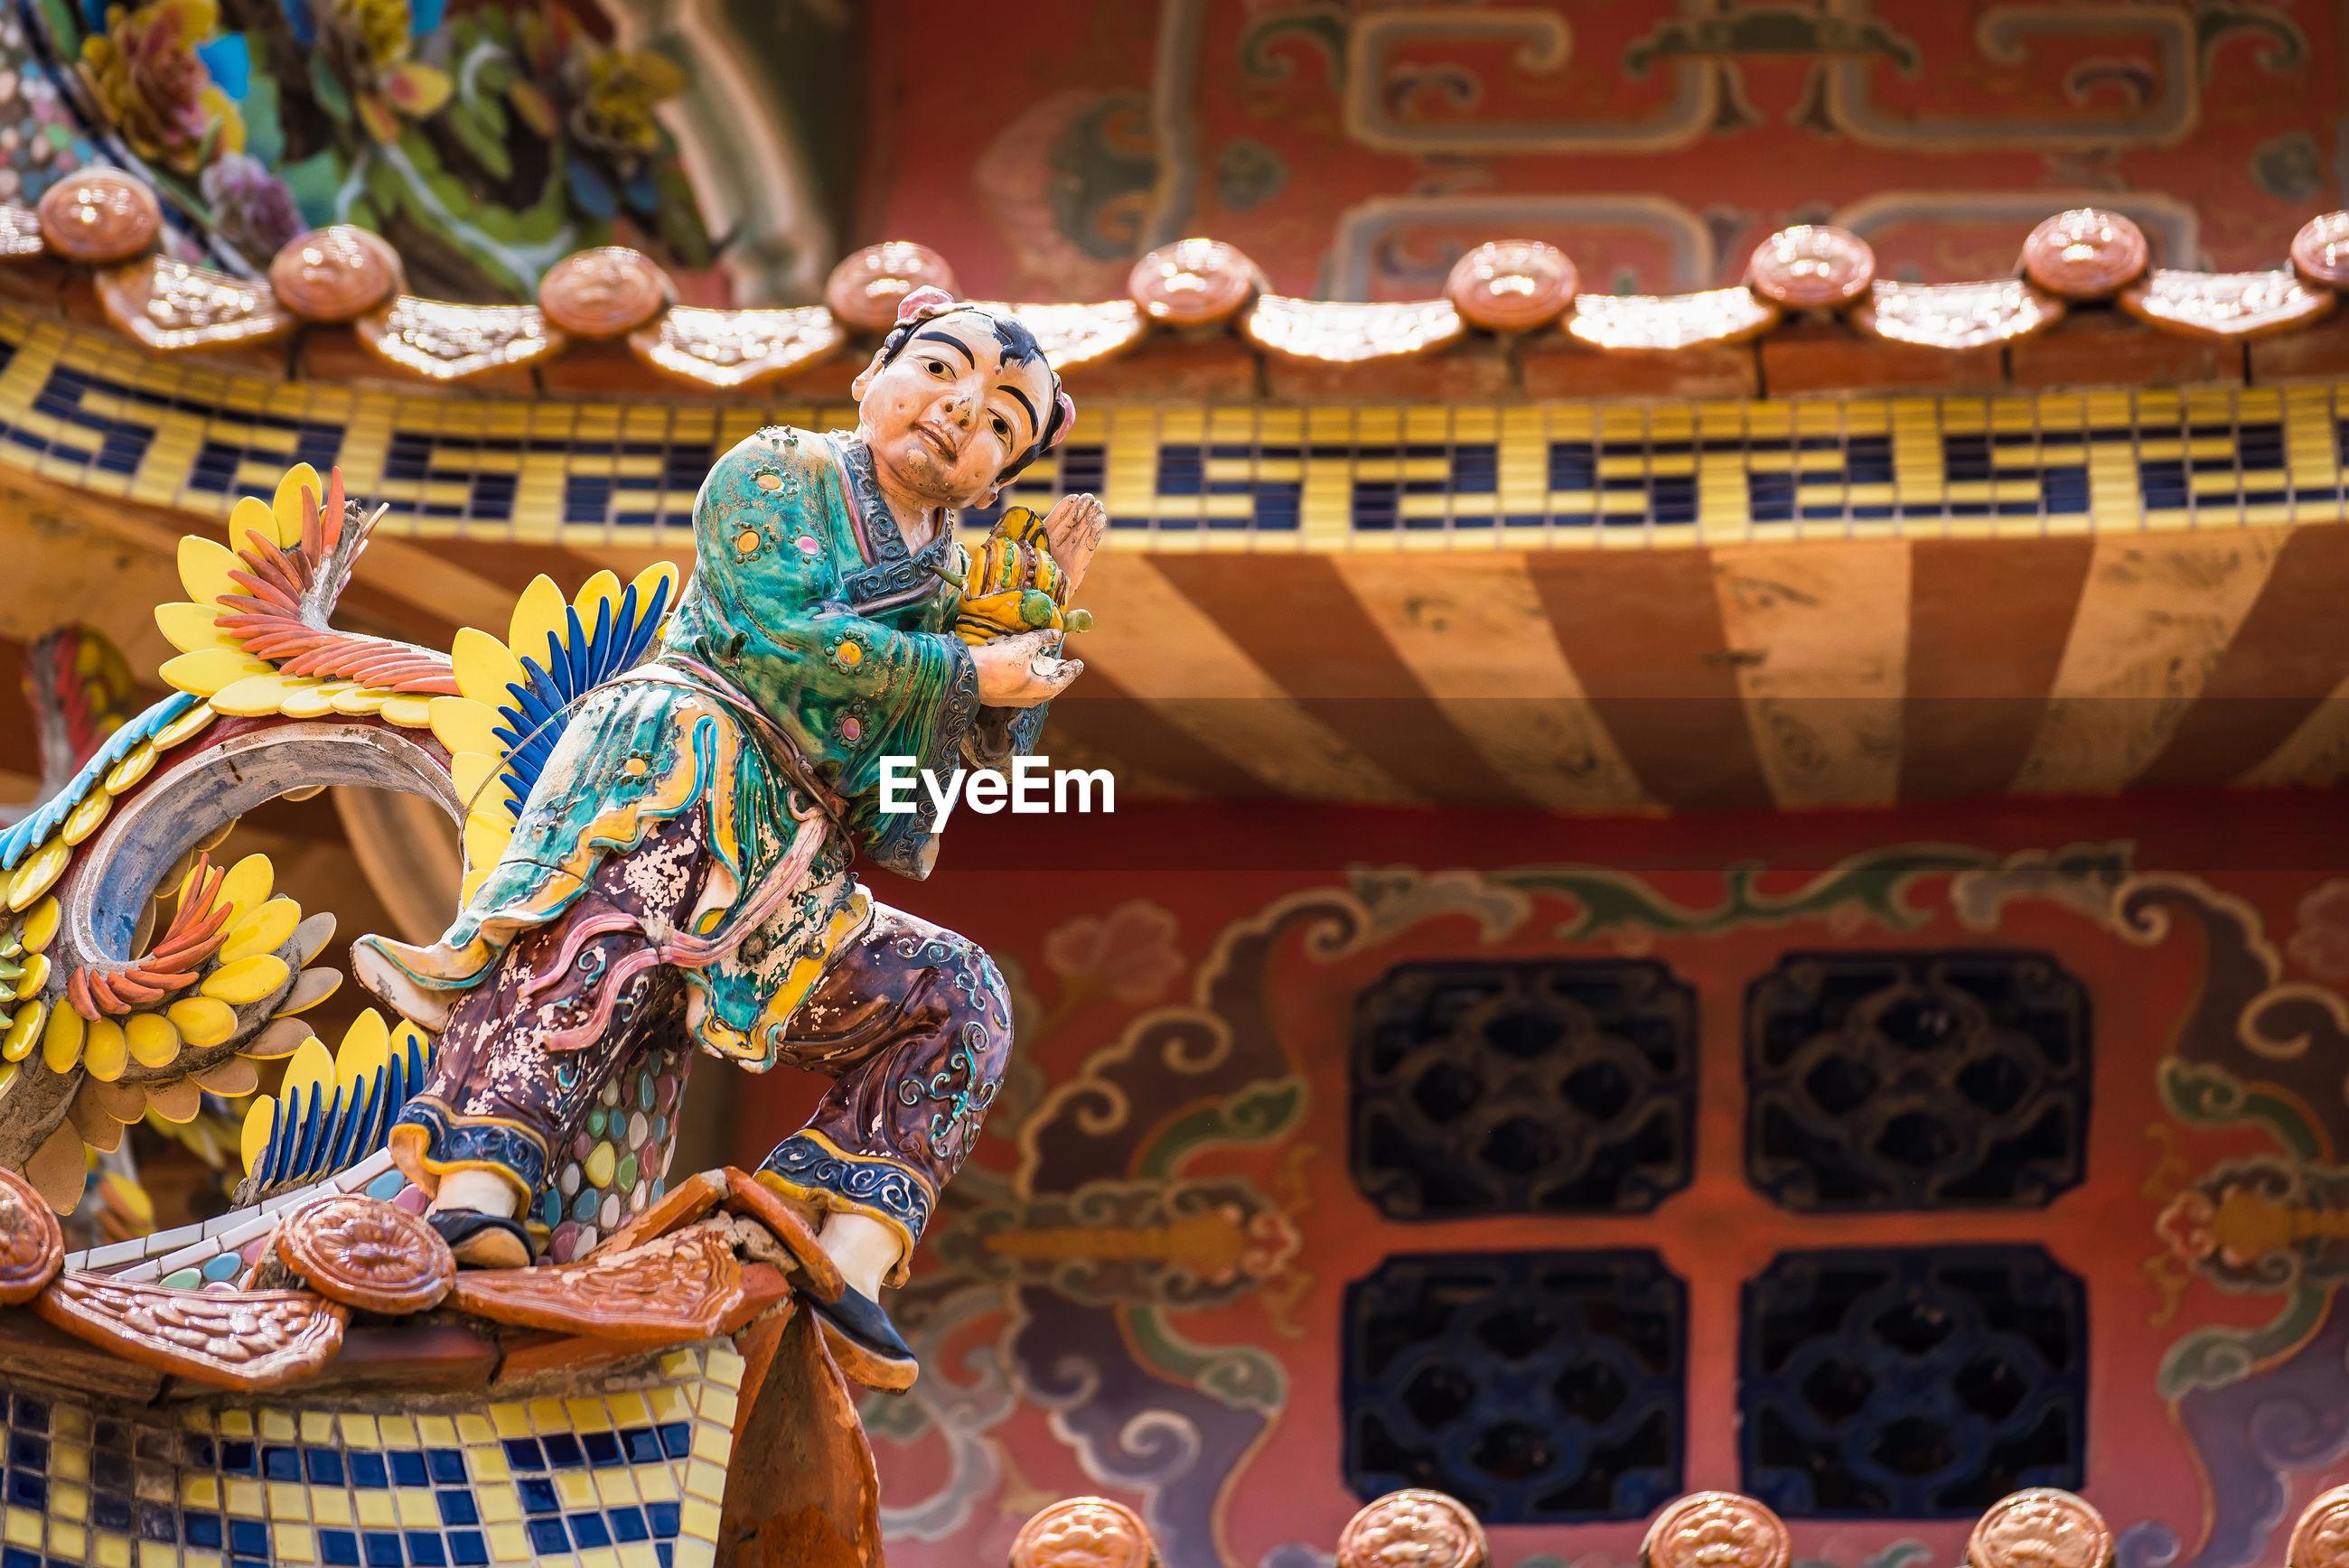 Statue against buddhist temple